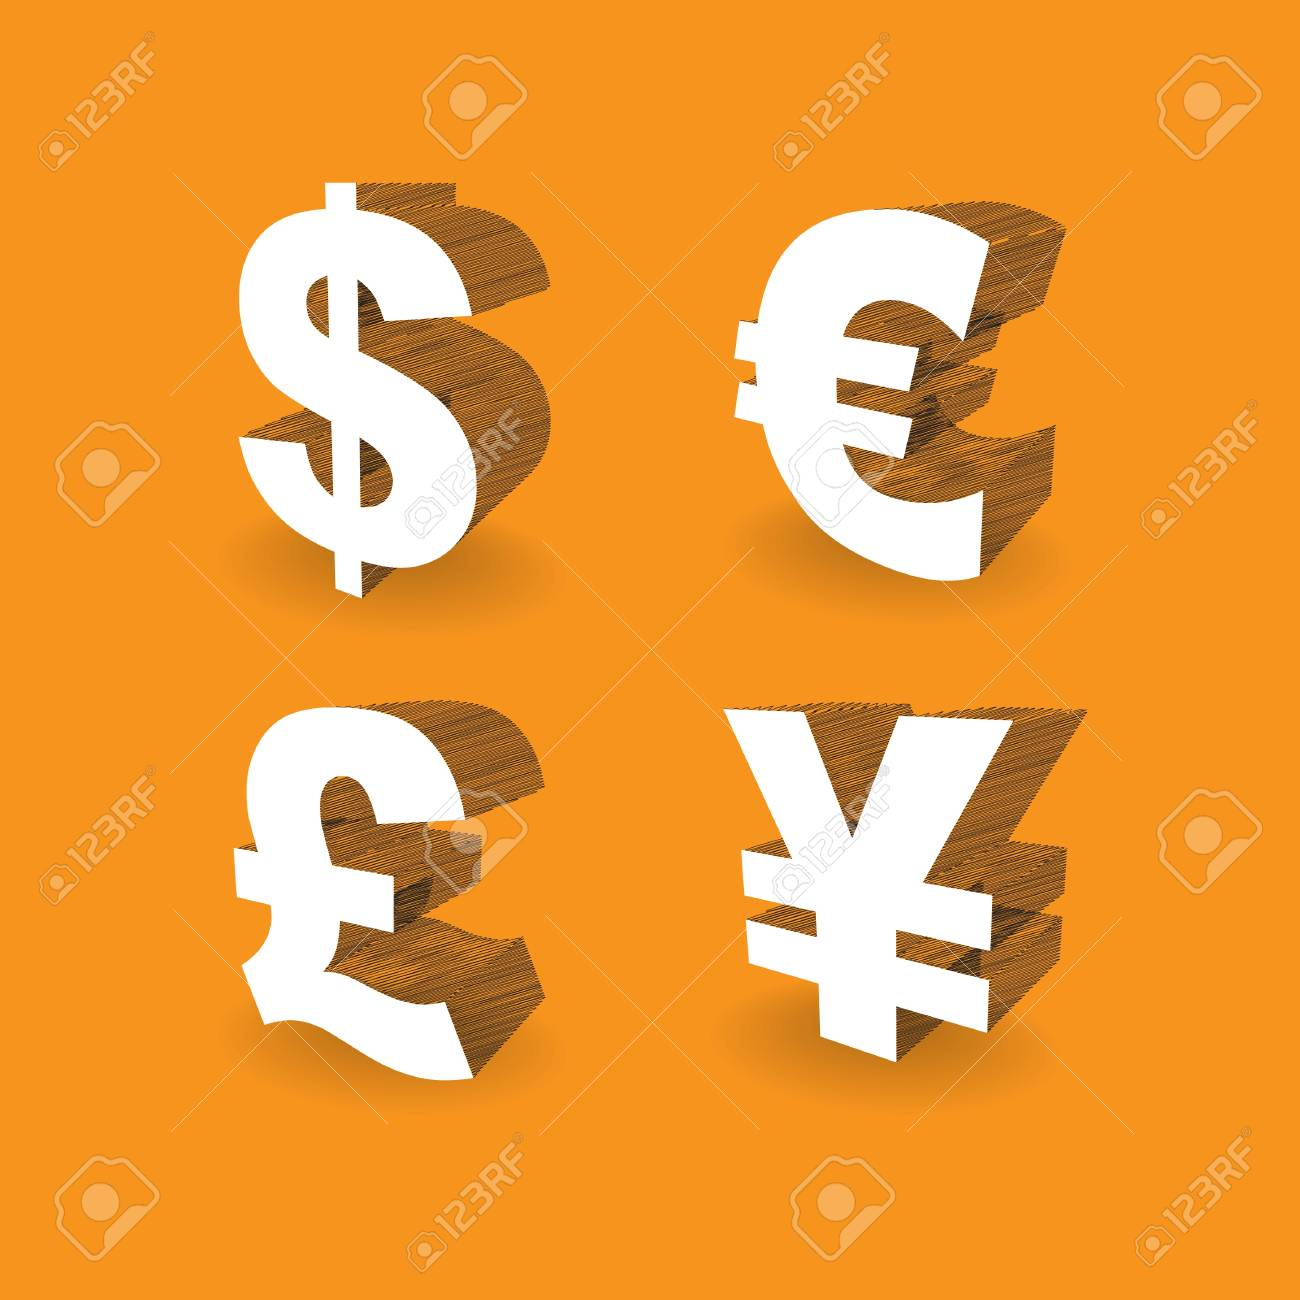 3d Currencies Symbols Dollar Pound Euro And Yen Illustration